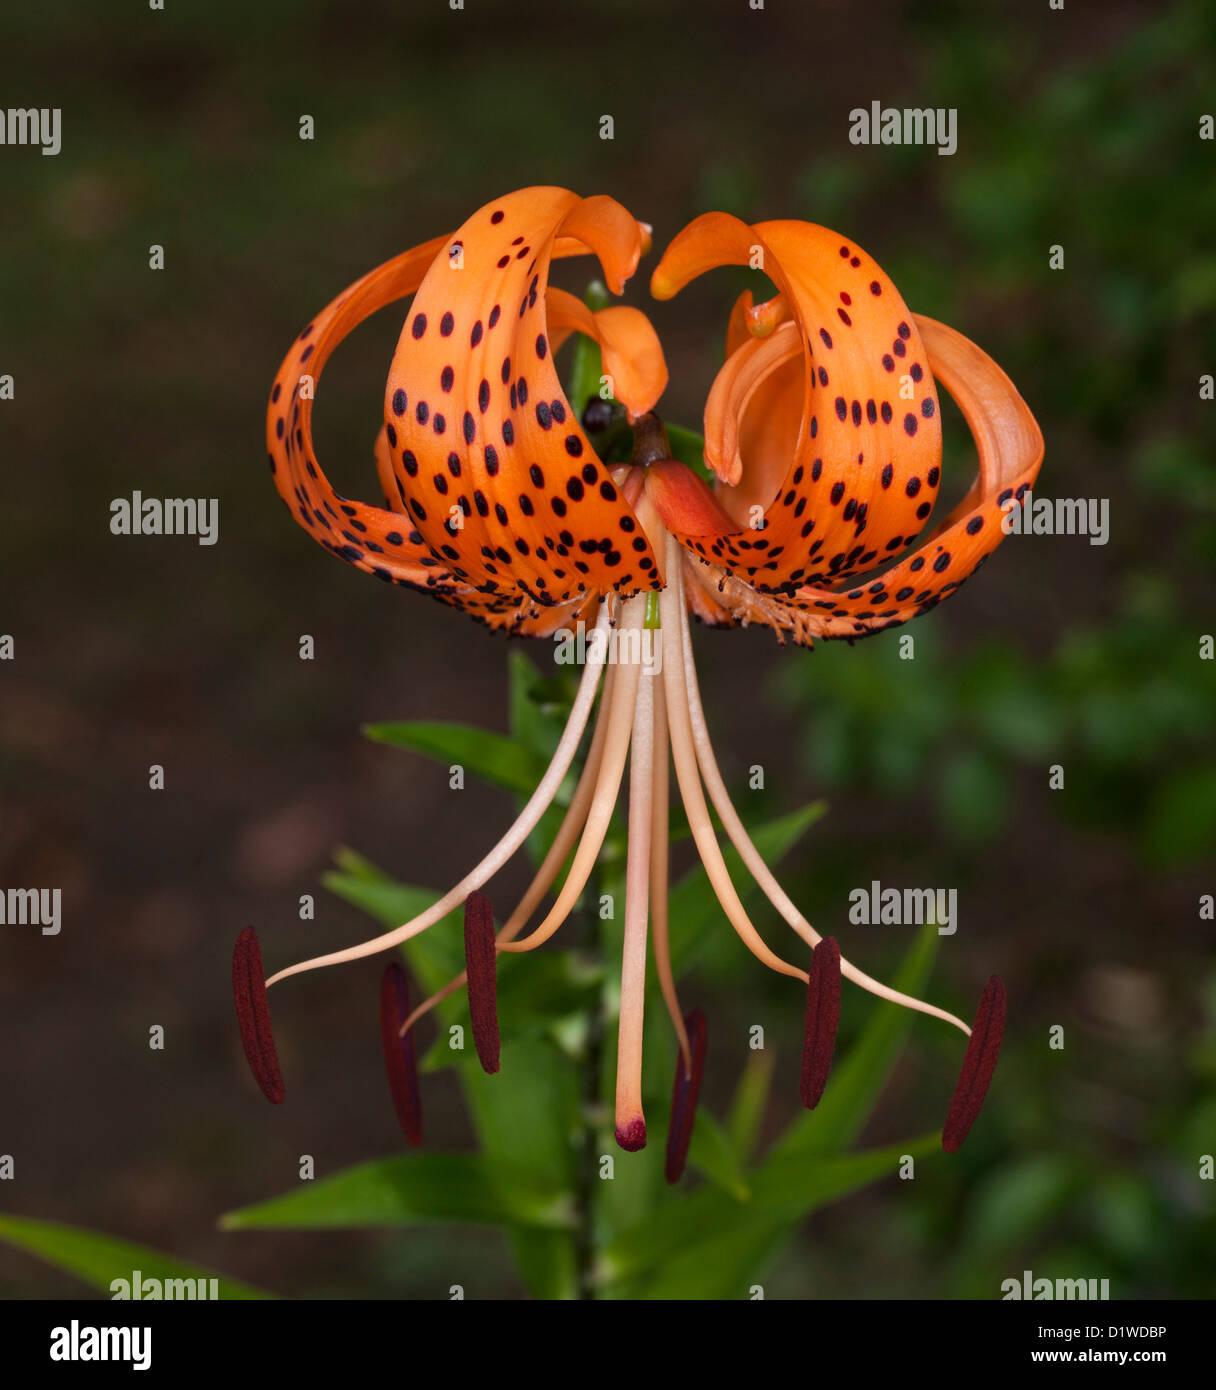 Spectacular bright orange flower with black spots - Tiger Lily - Lilium tigrinum - against a dark background Stock Photo